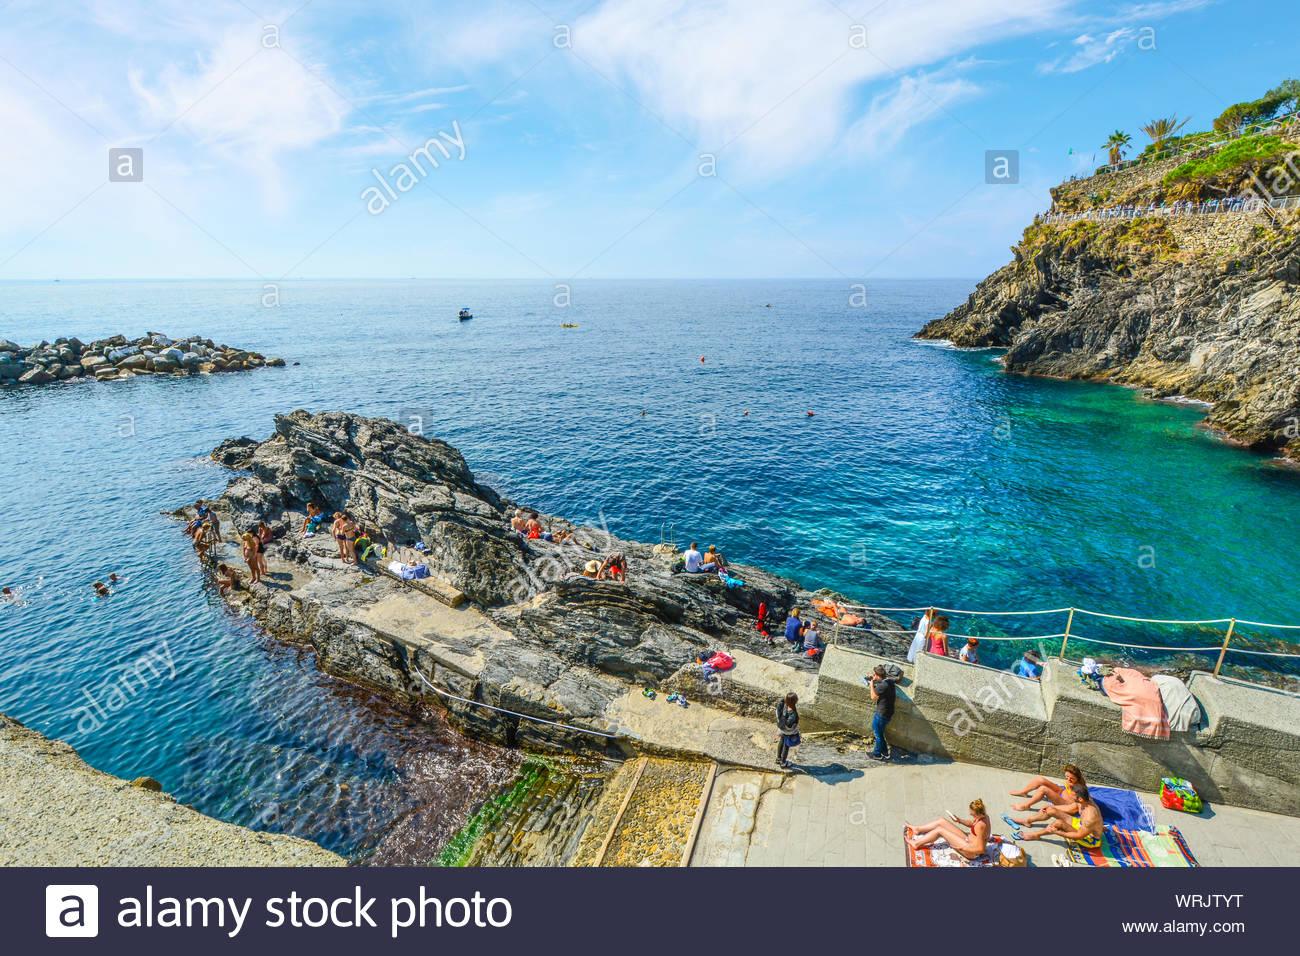 Tourists swim in the sea and sunbathe near the the rocky coastline of Manarola, Italy, part of the Cinque Terre. Stock Photo